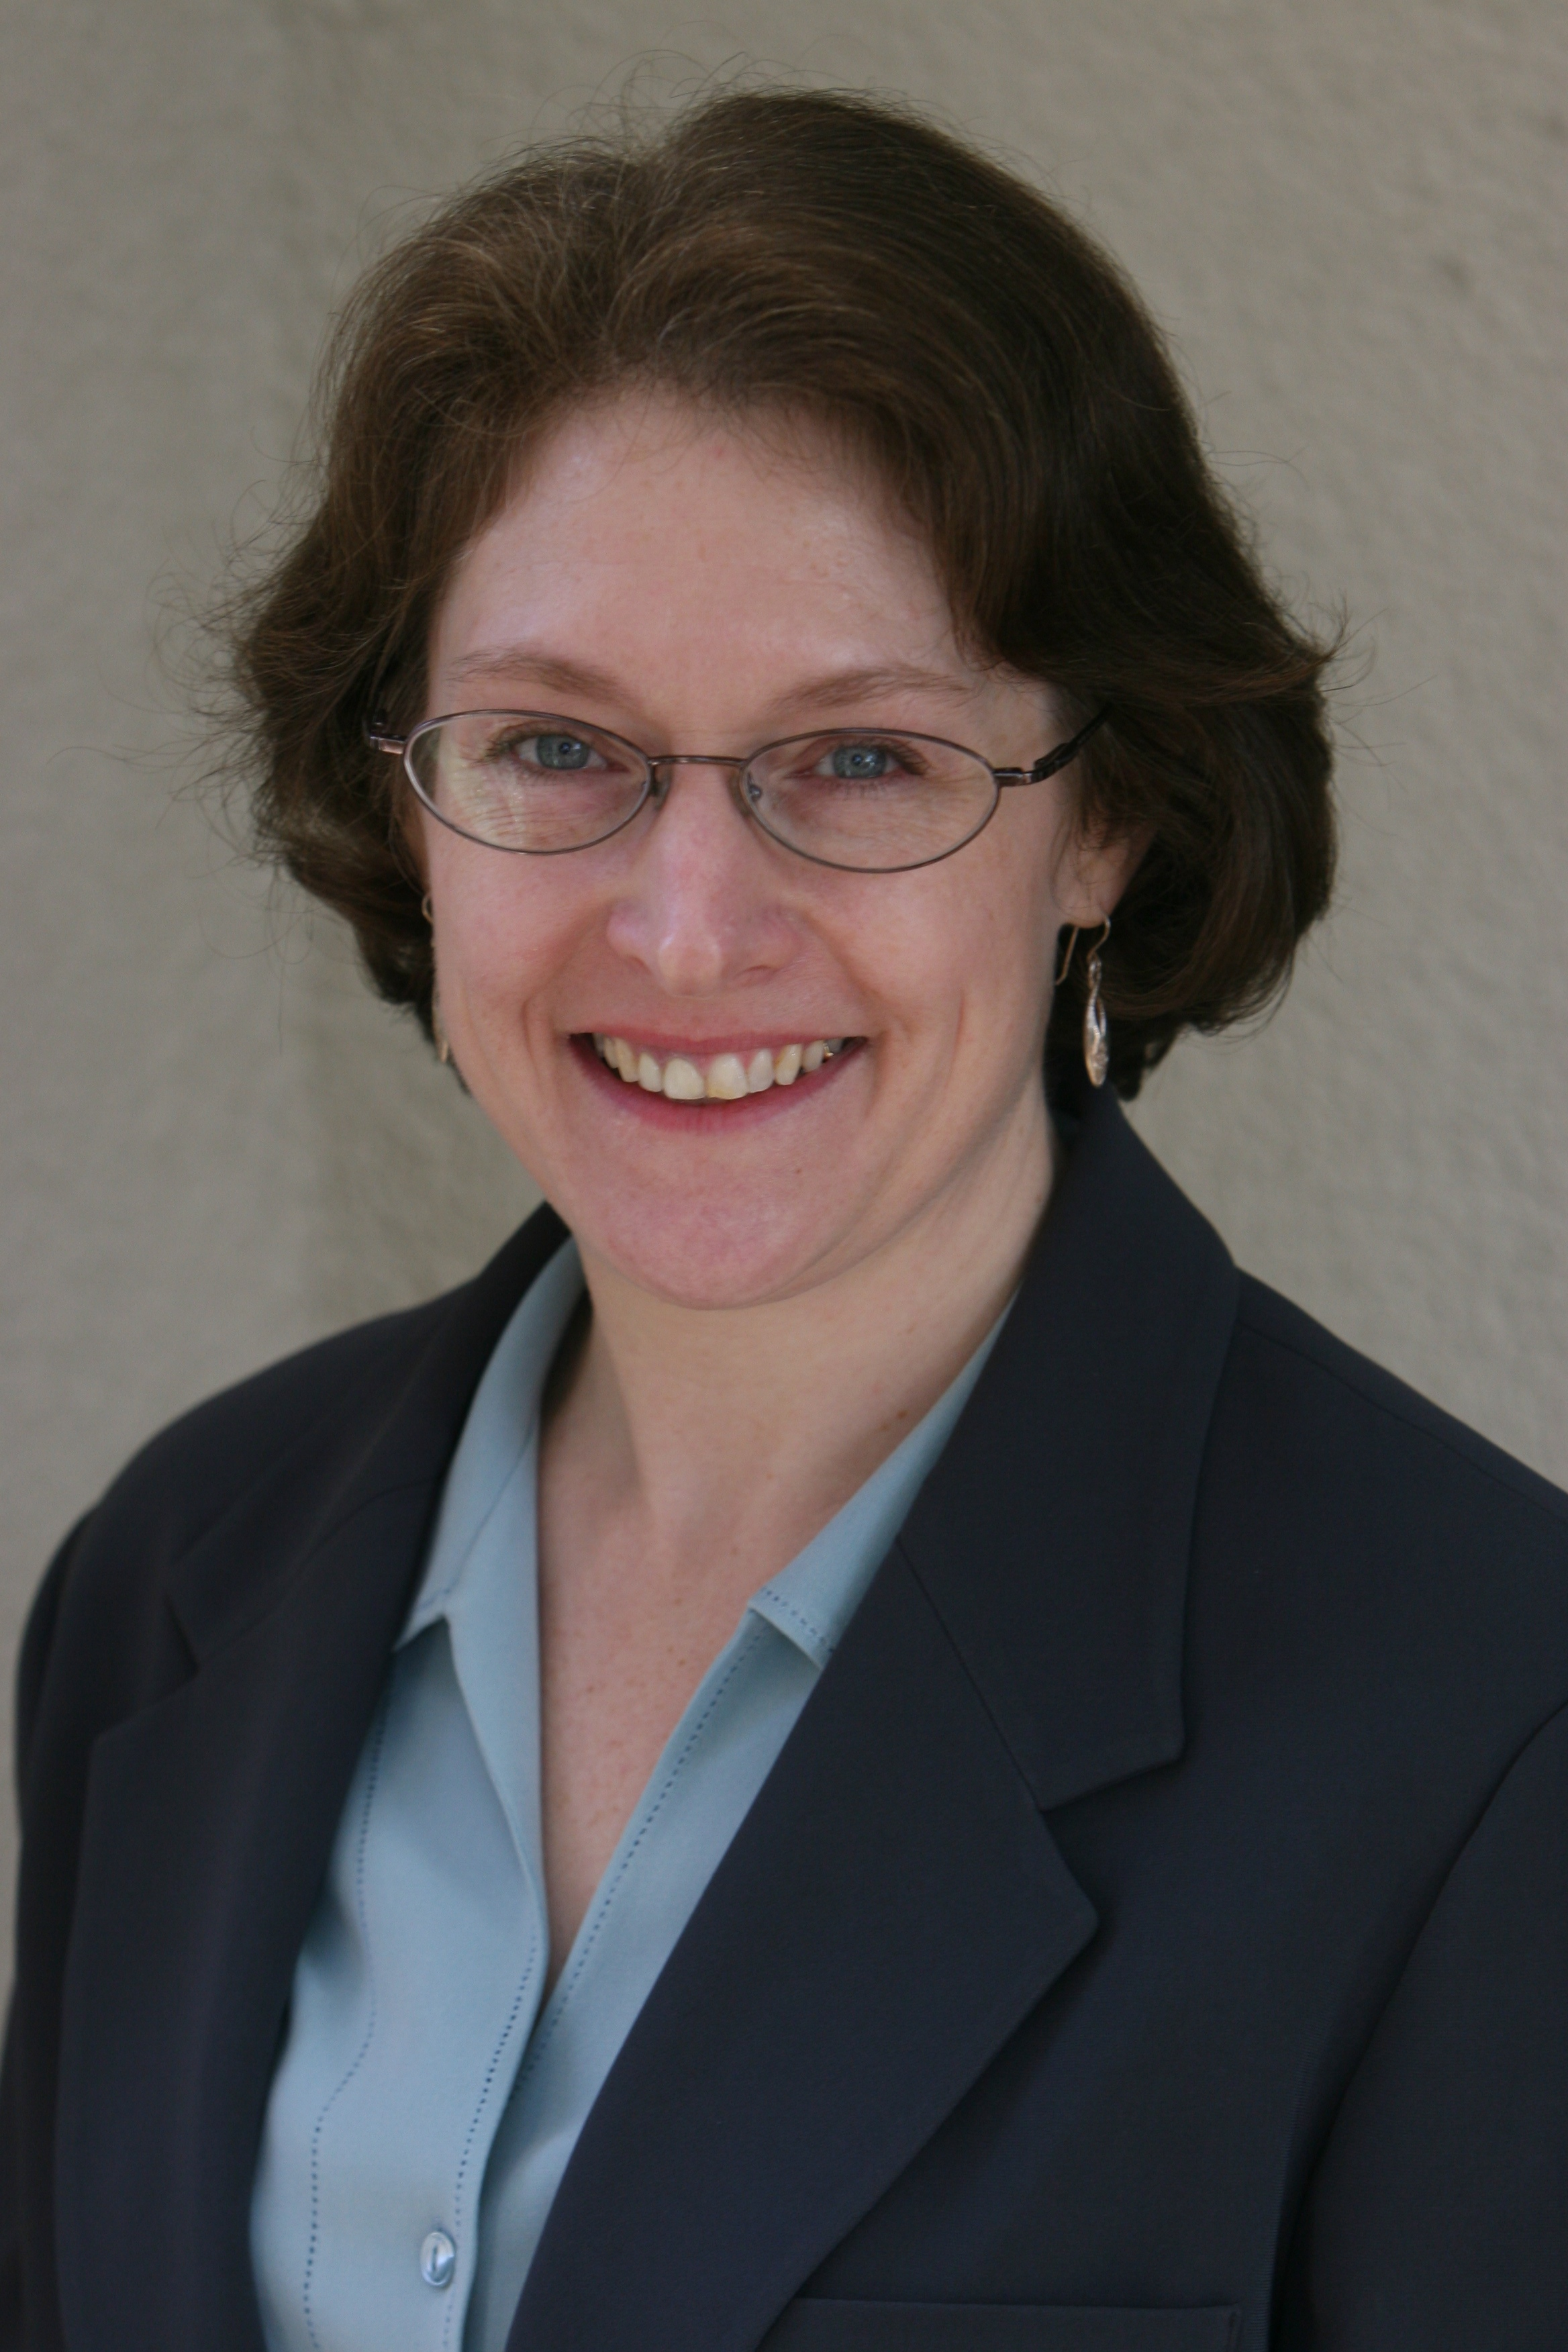 elisabeth hendrickson